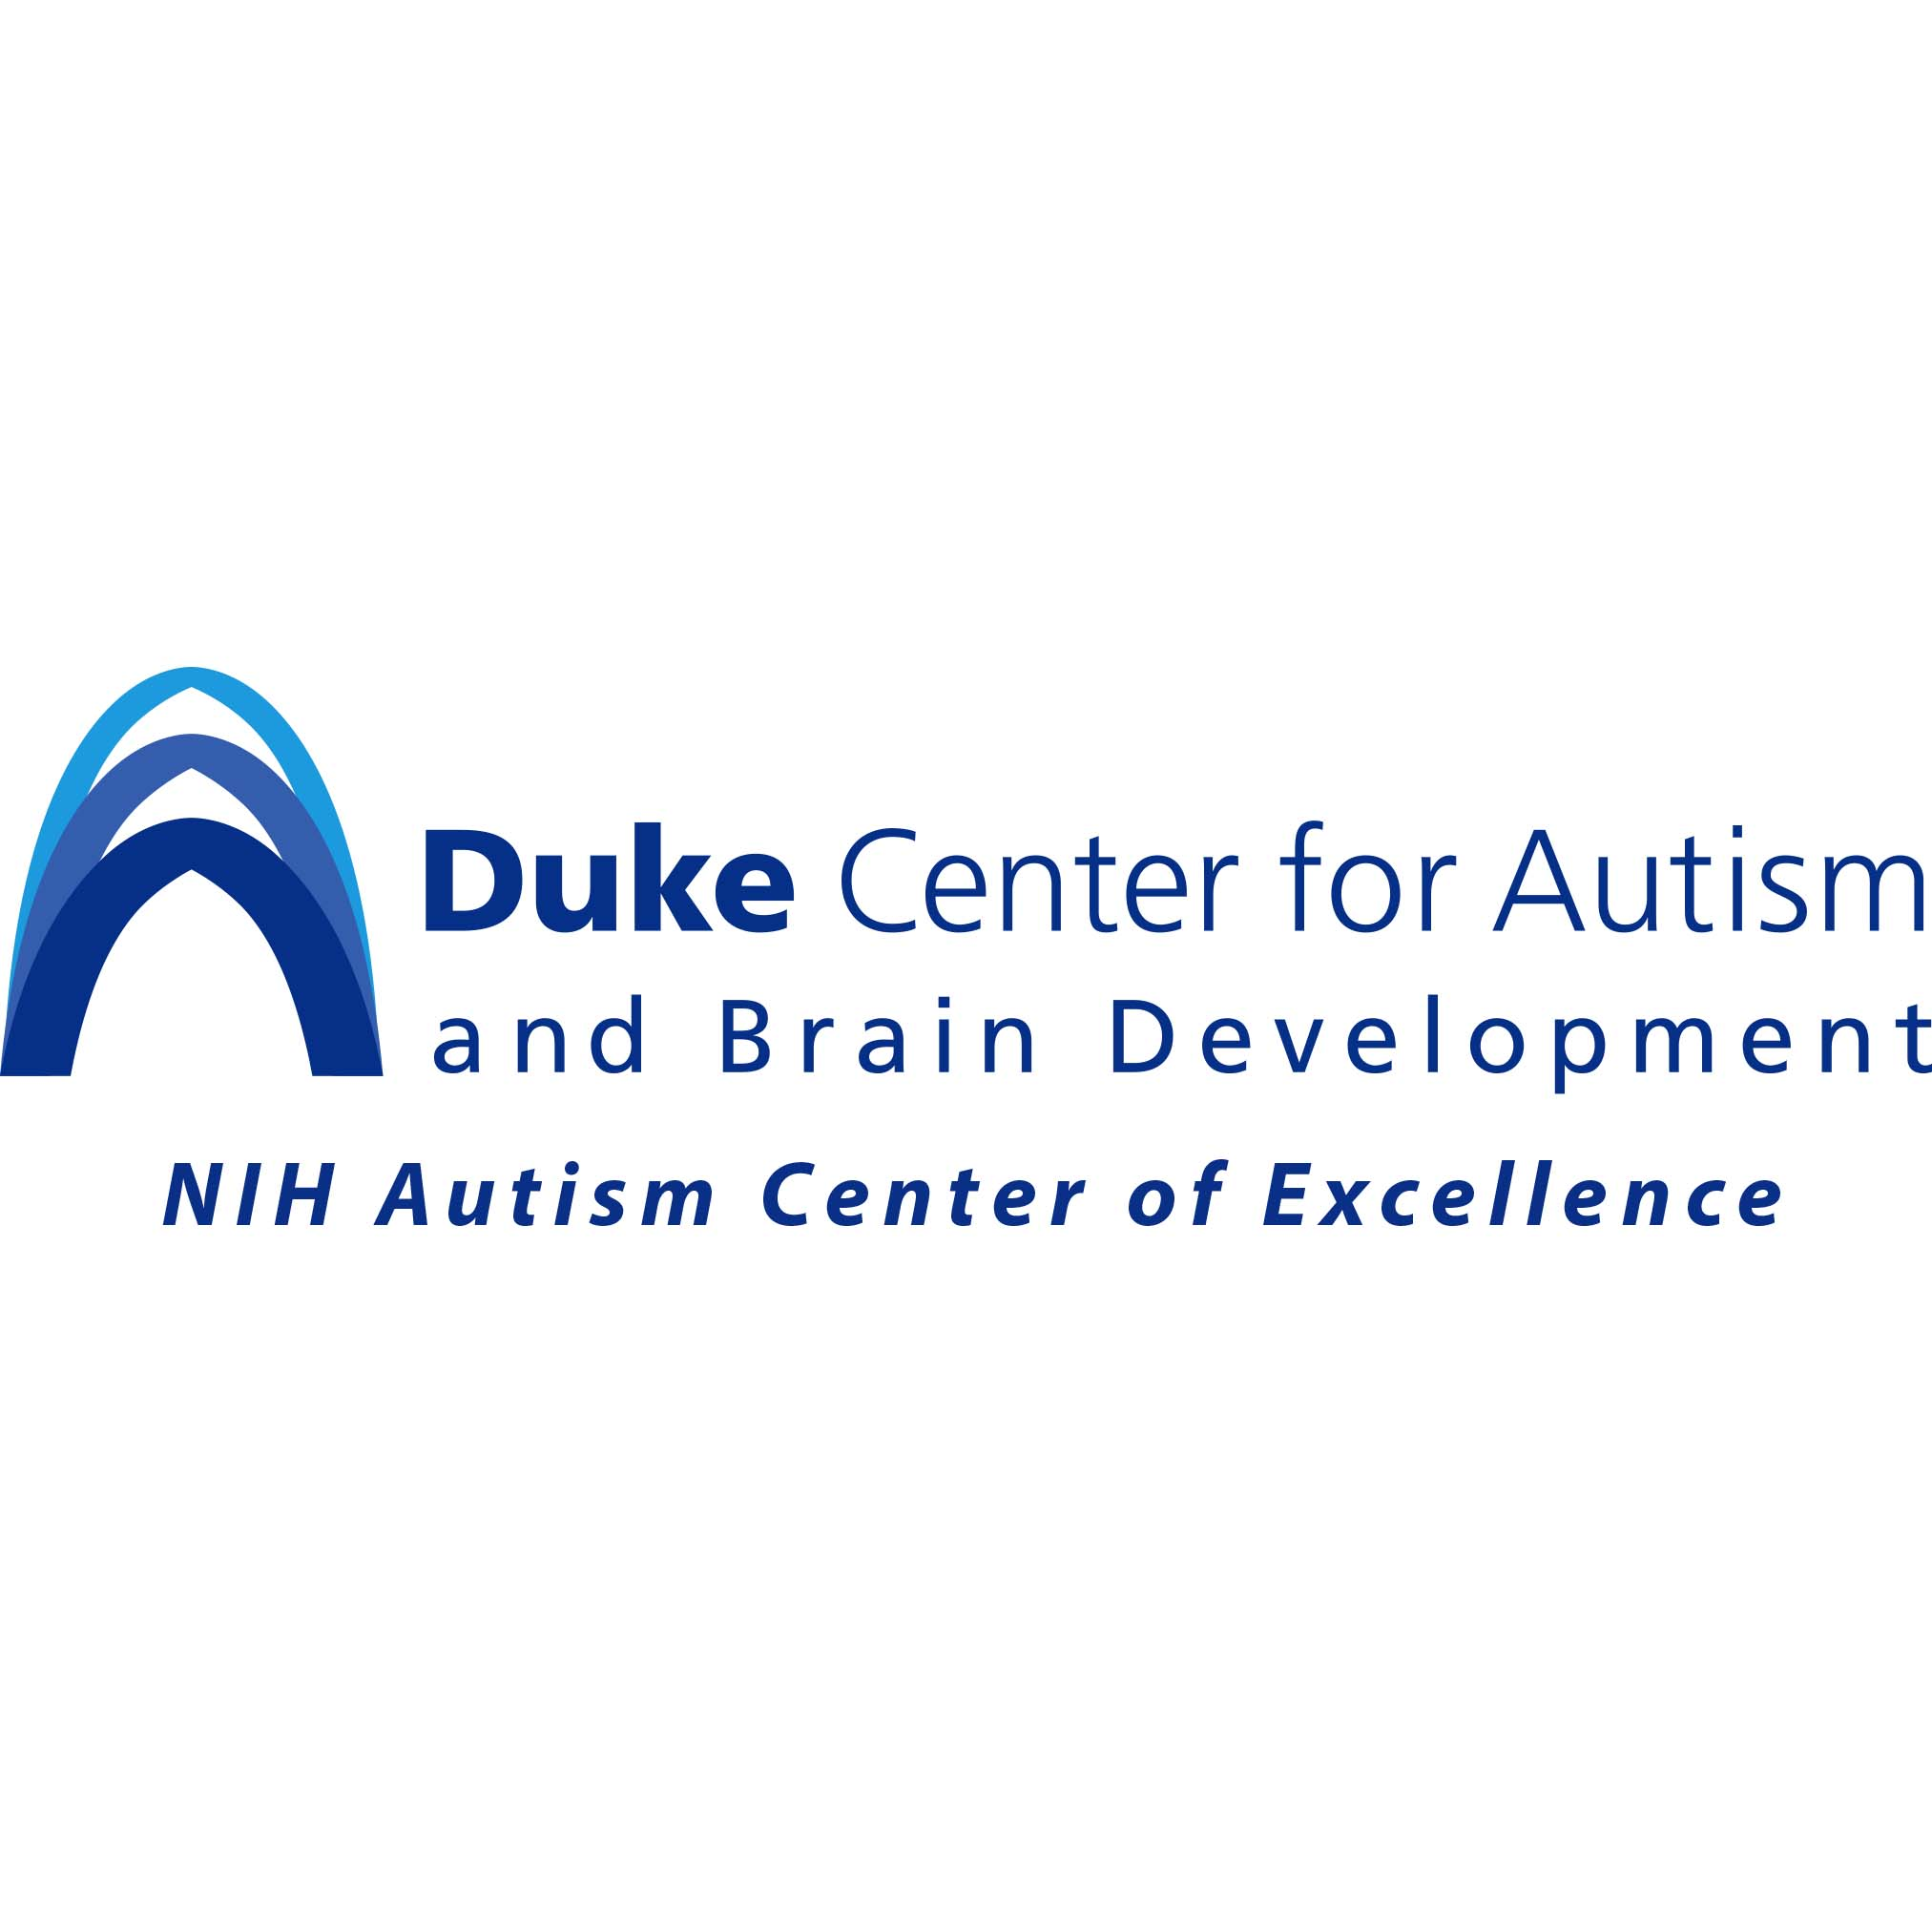 Sponsor NIH ACE - Research Study & Registry